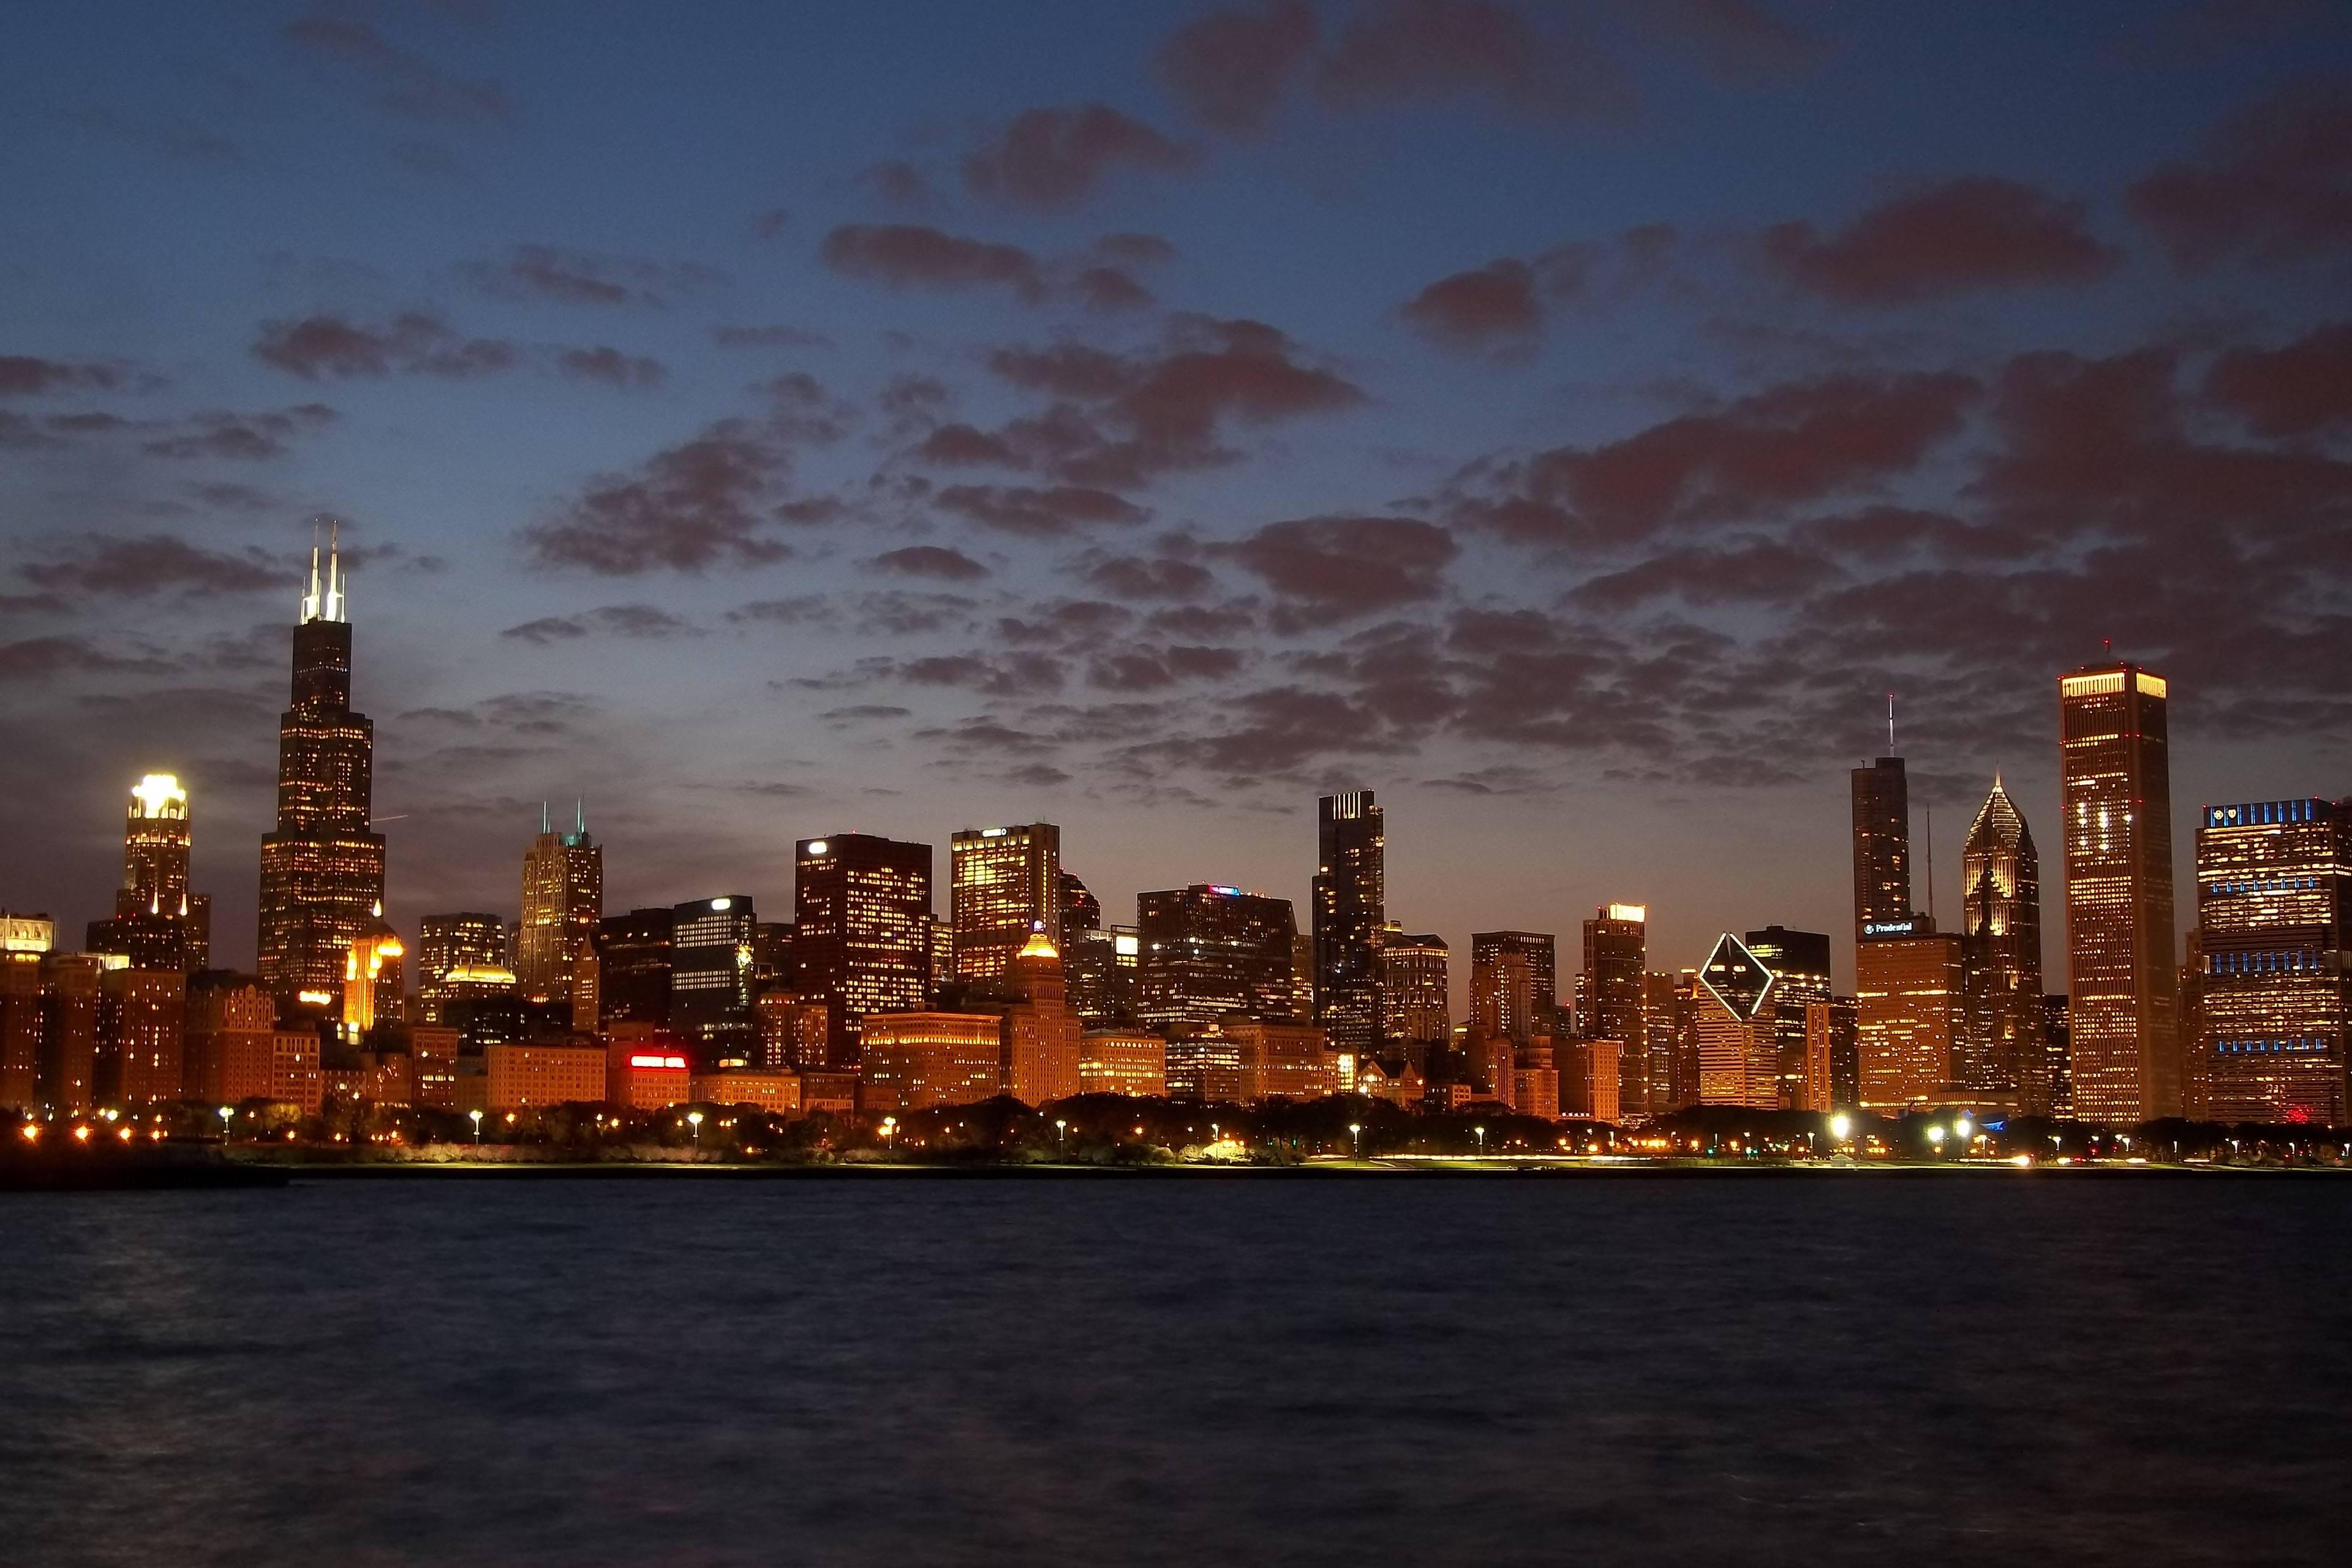 chicago night skyline wallpaper - photo #3